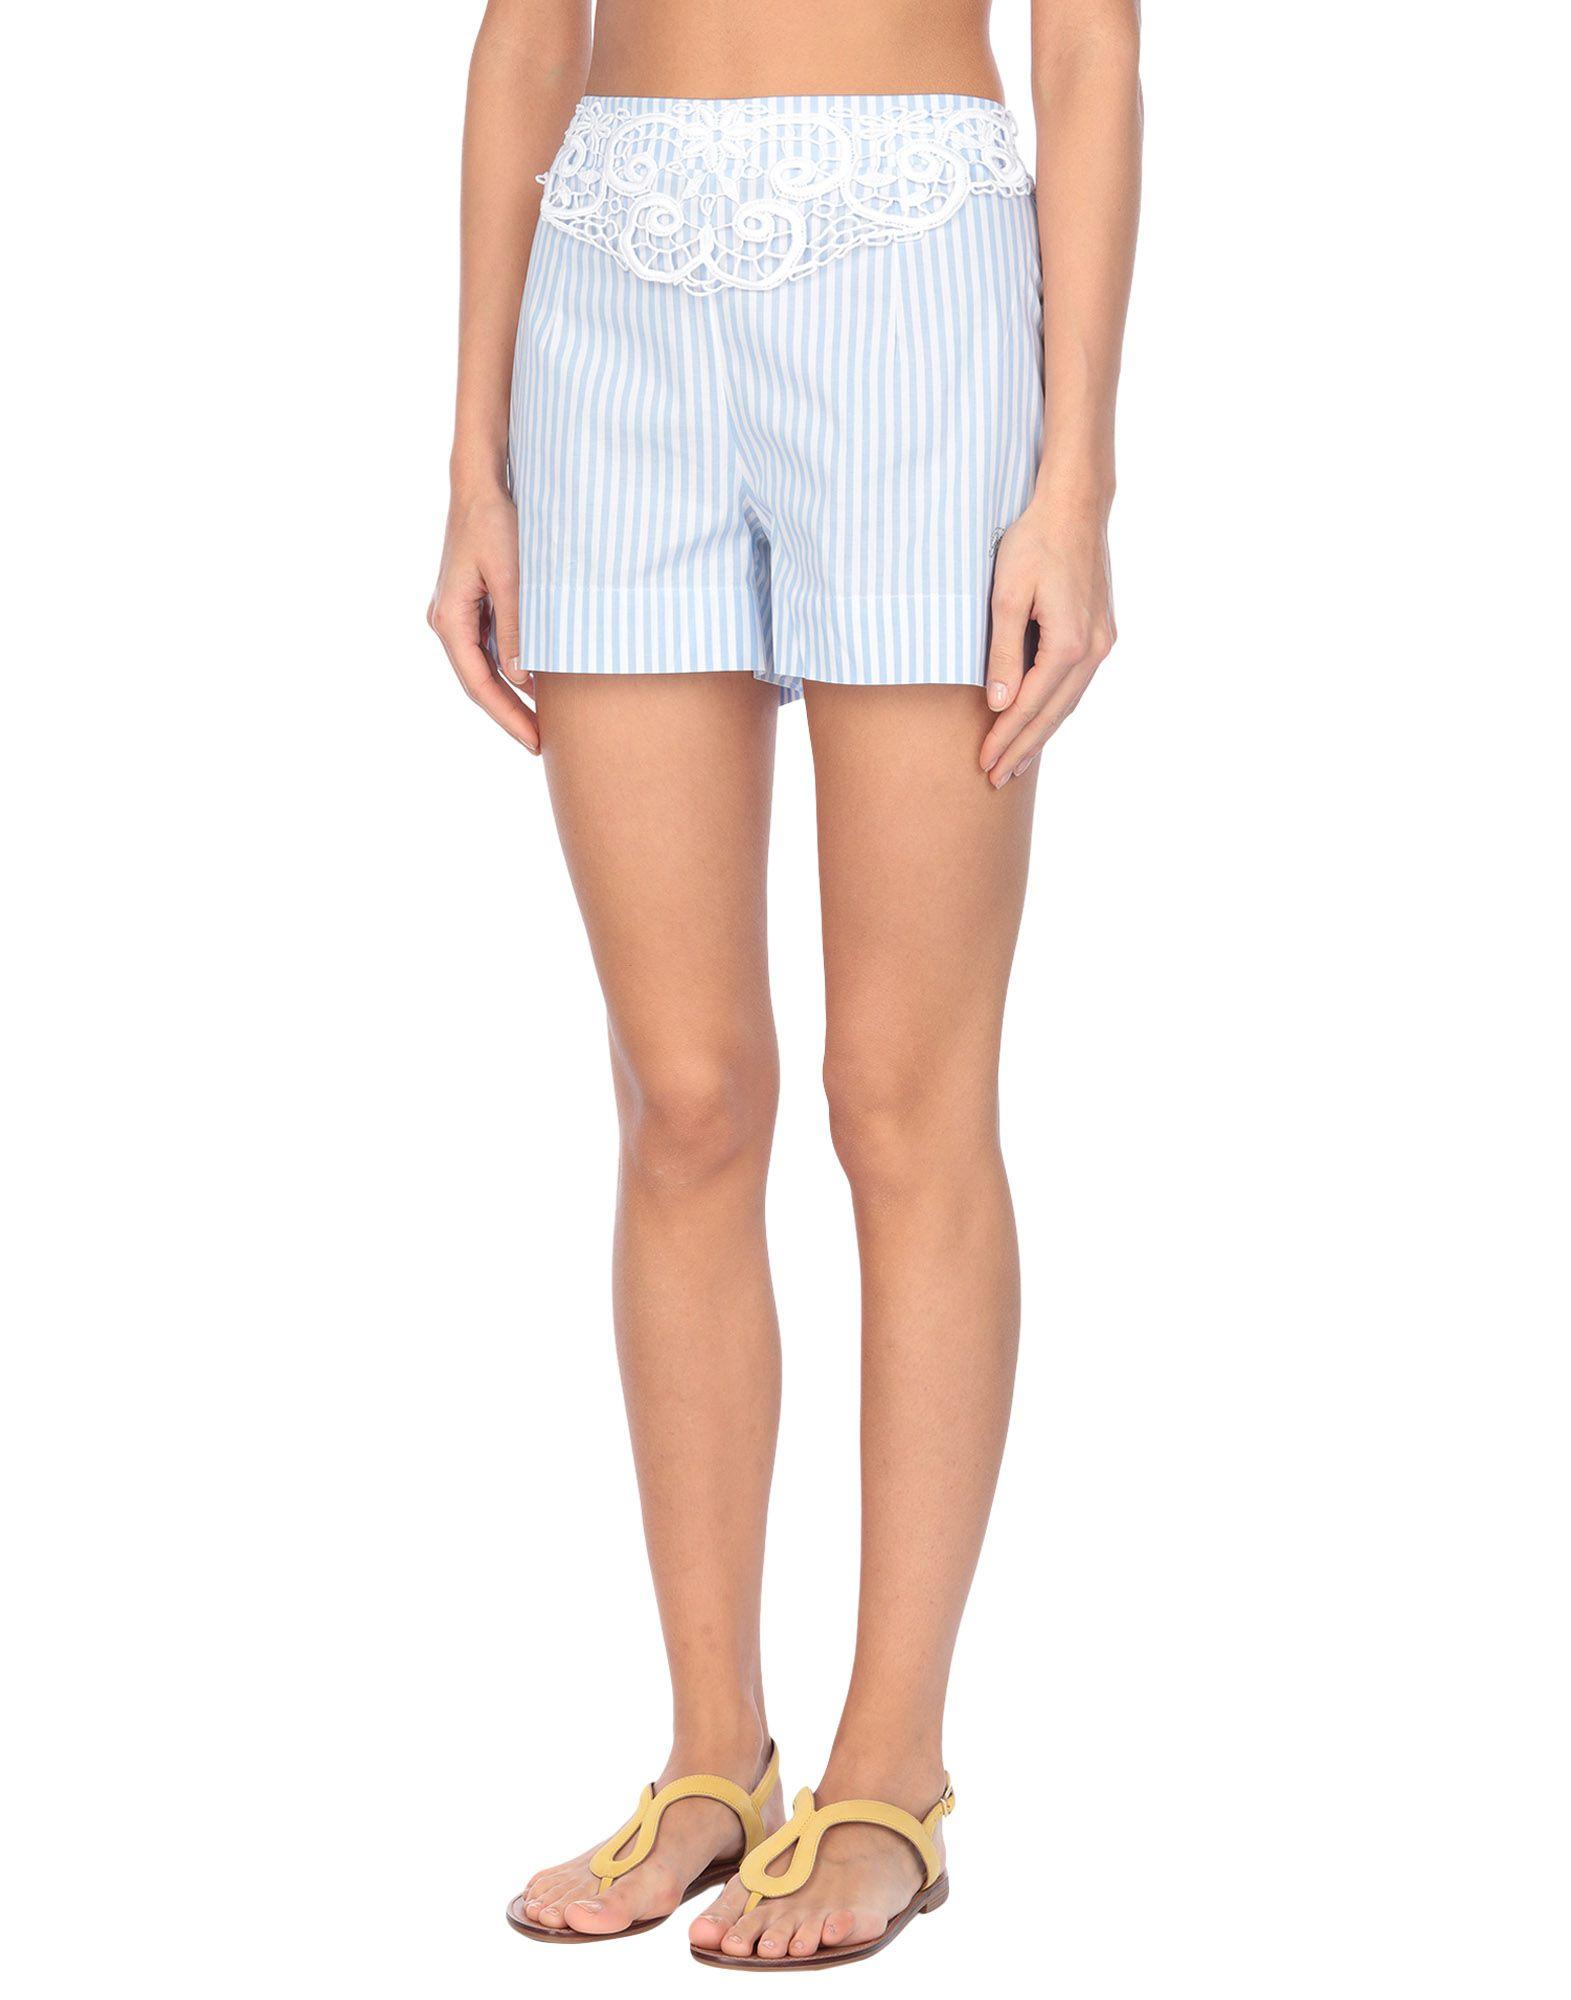 BLUMARINE BEACHWEAR Пляжные брюки и шорты blugirl blumarine beachwear пляжные брюки и шорты